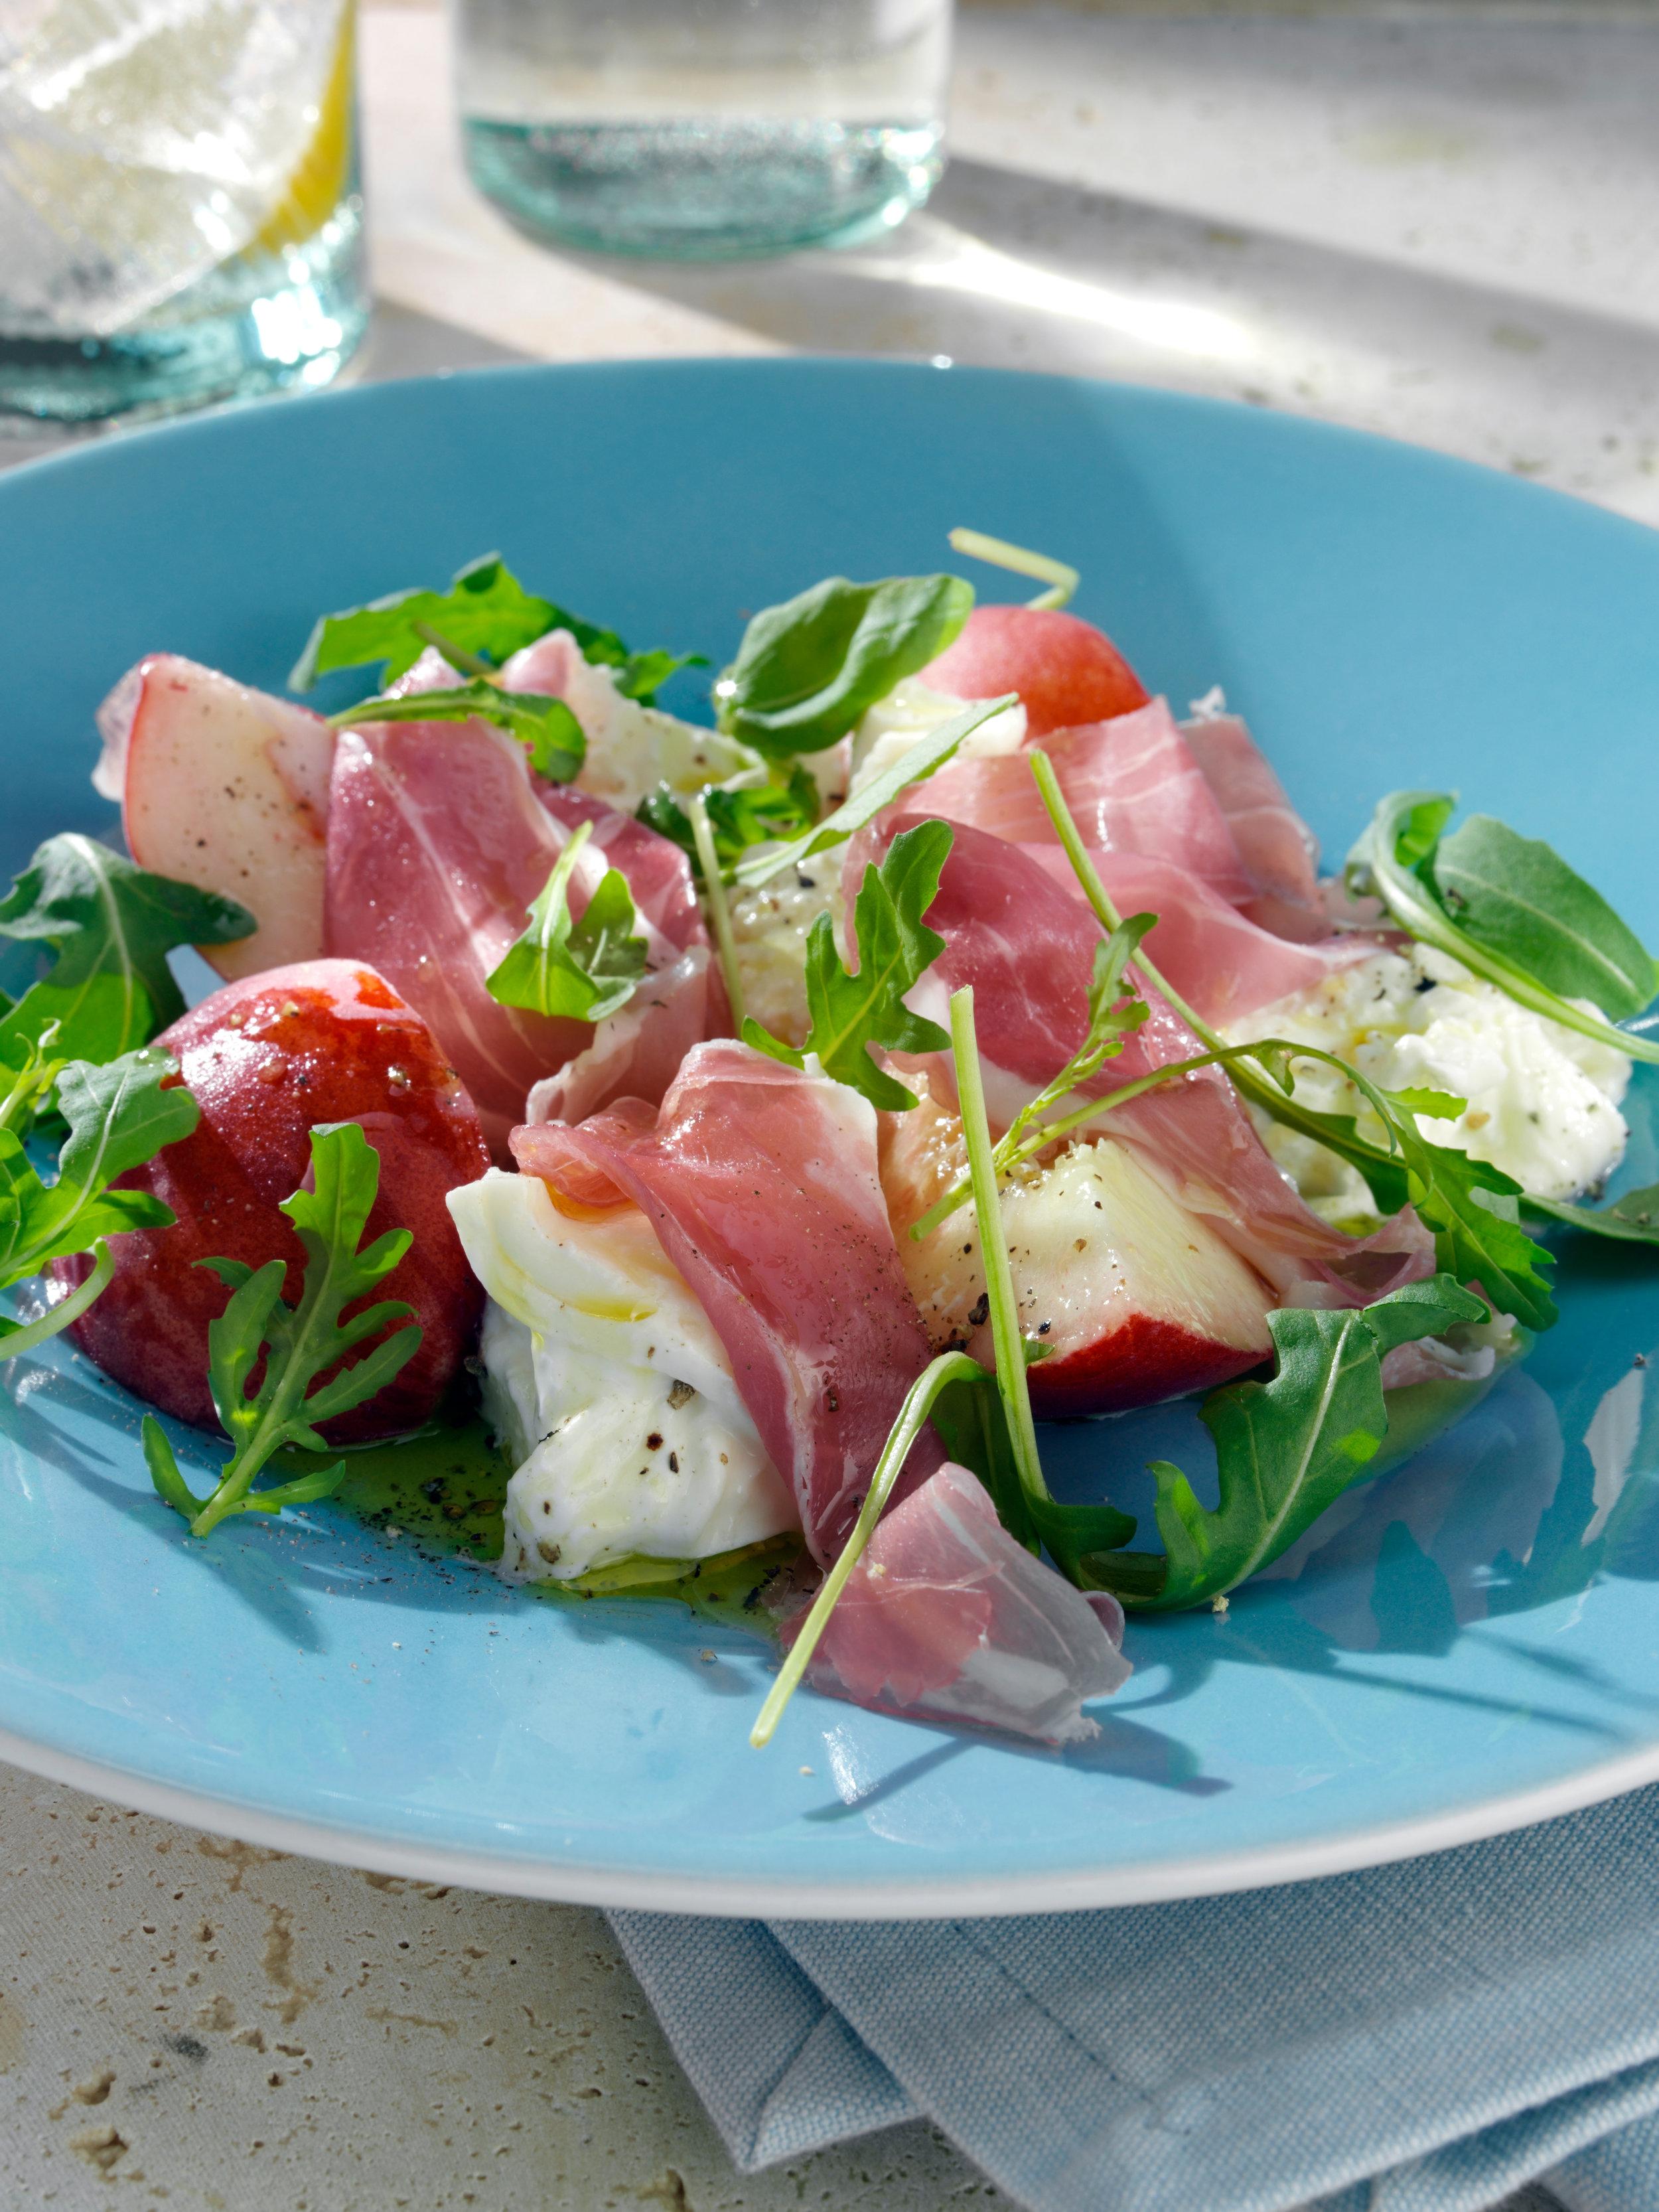 Summer salad of burrata, peaches and prosciutto